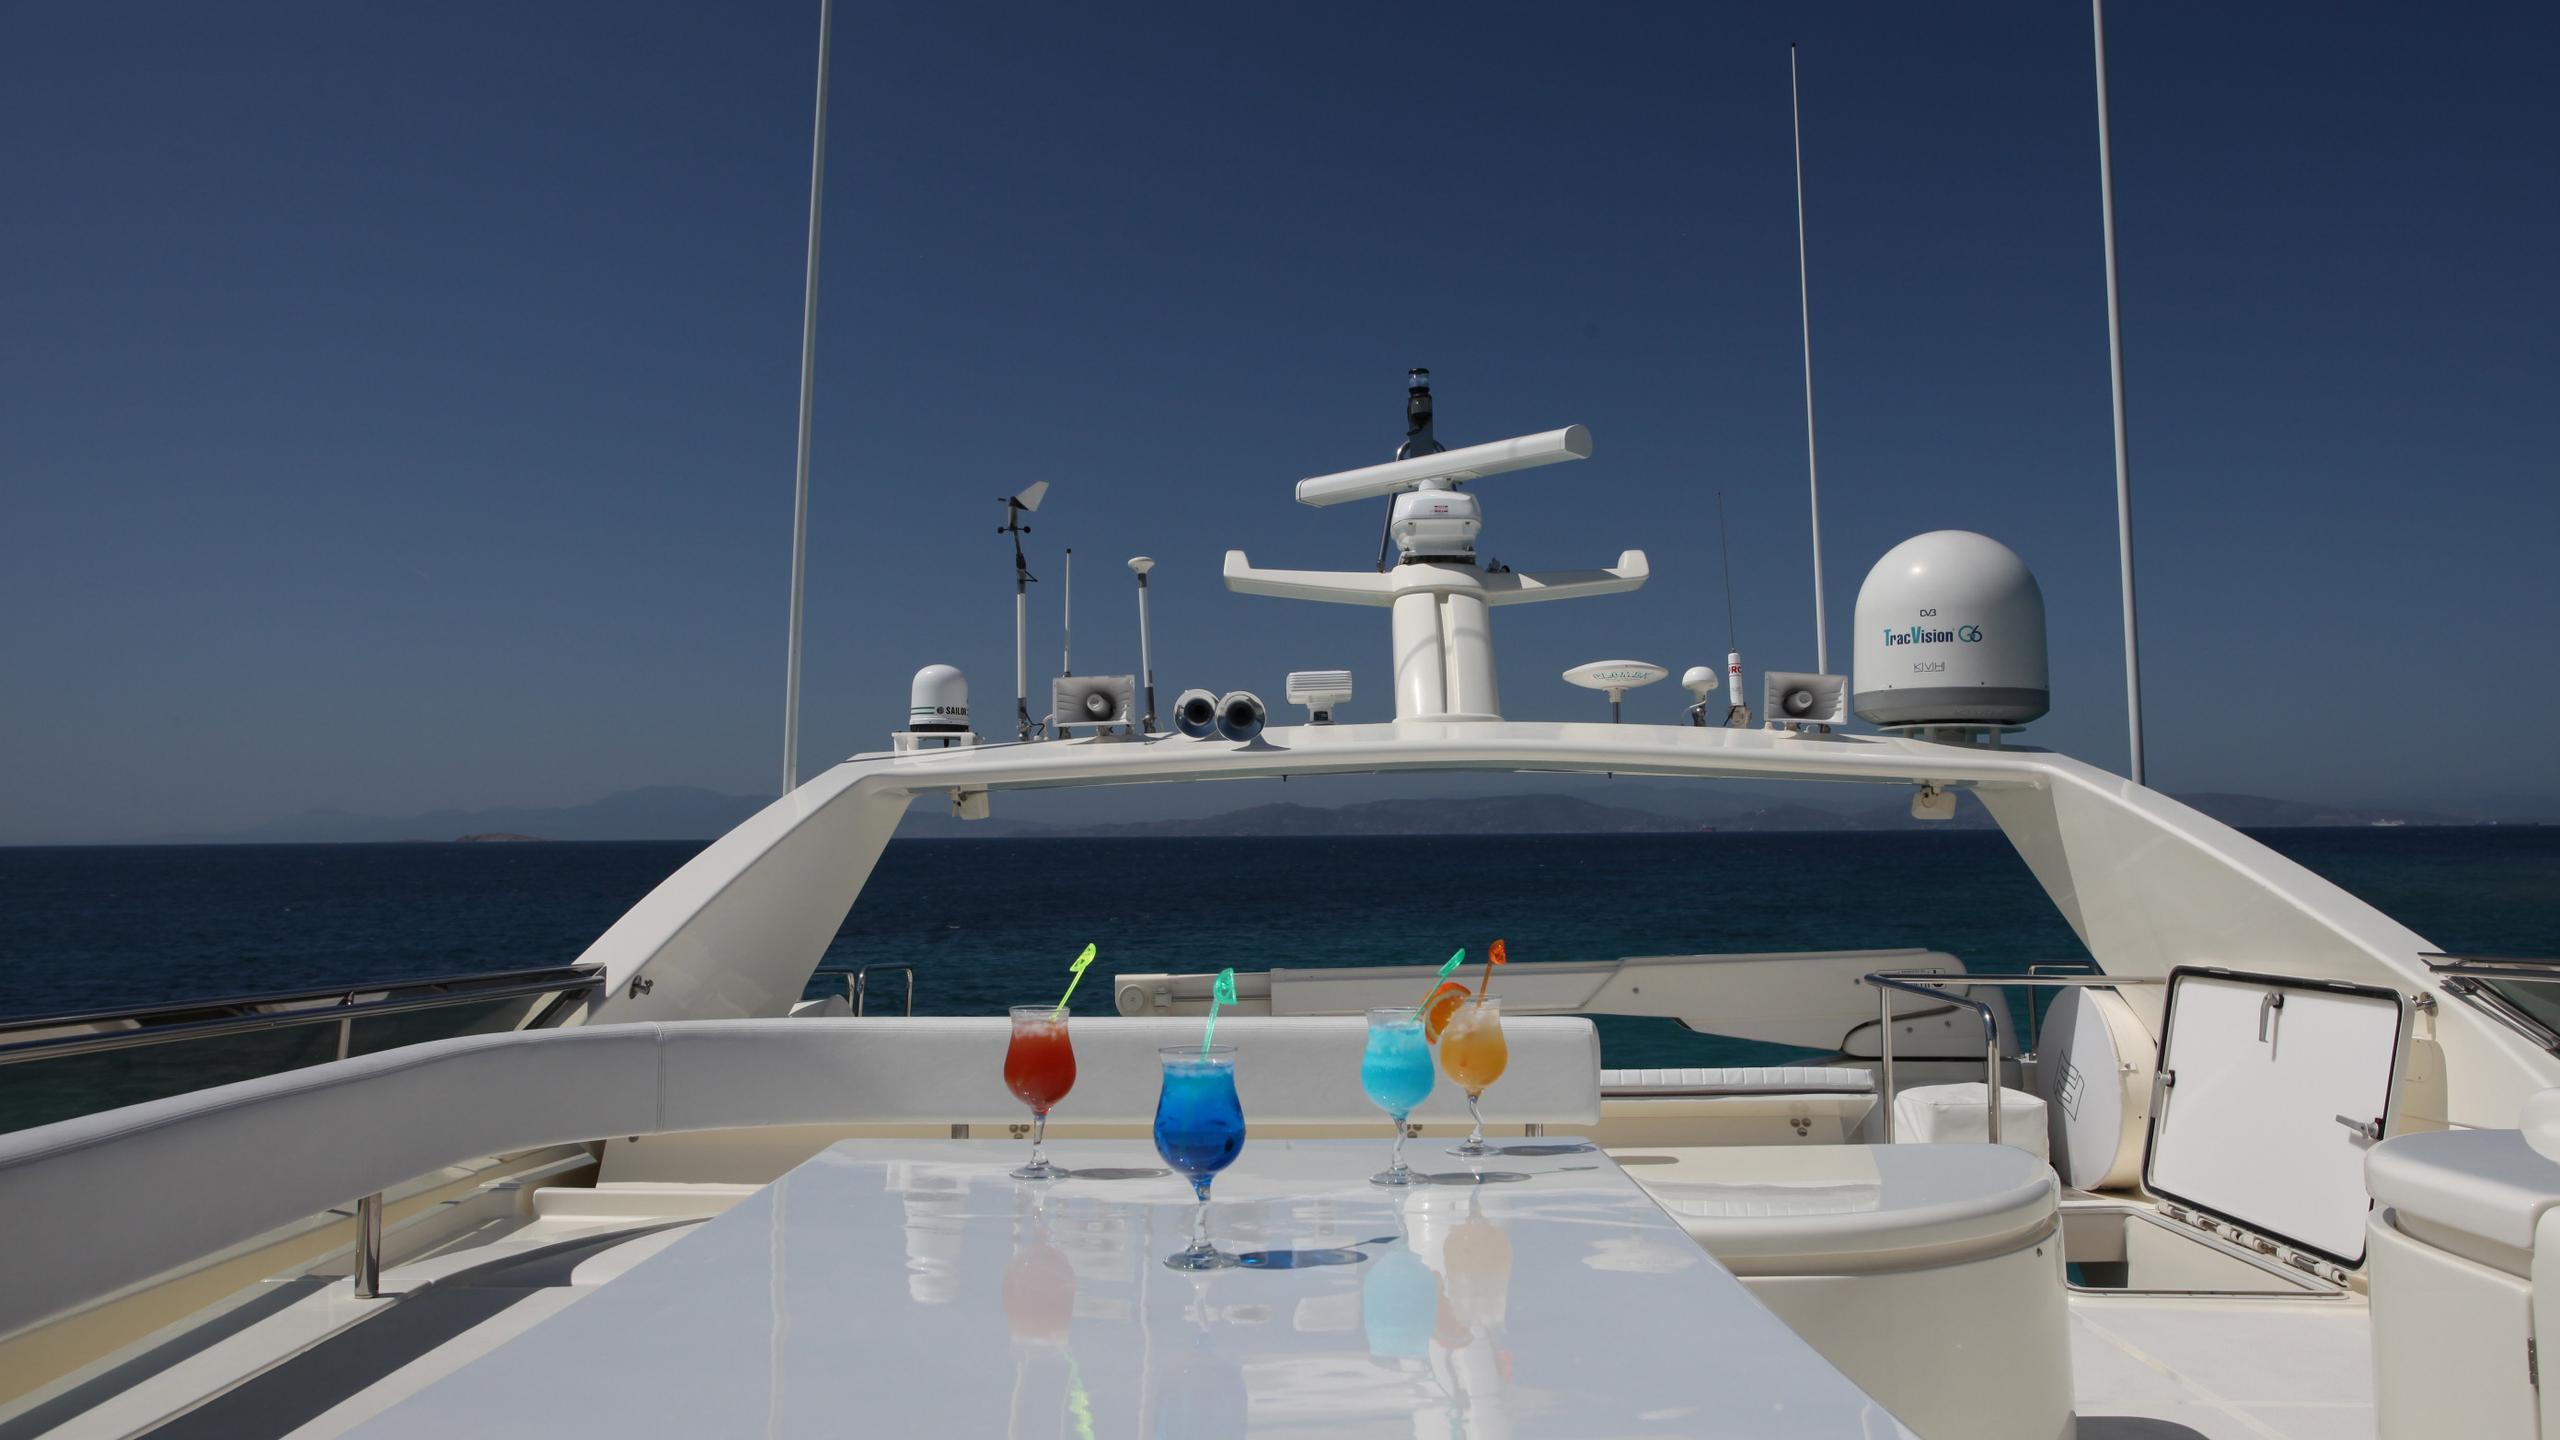 kentavros-ii-yacht-fly-deck-dining